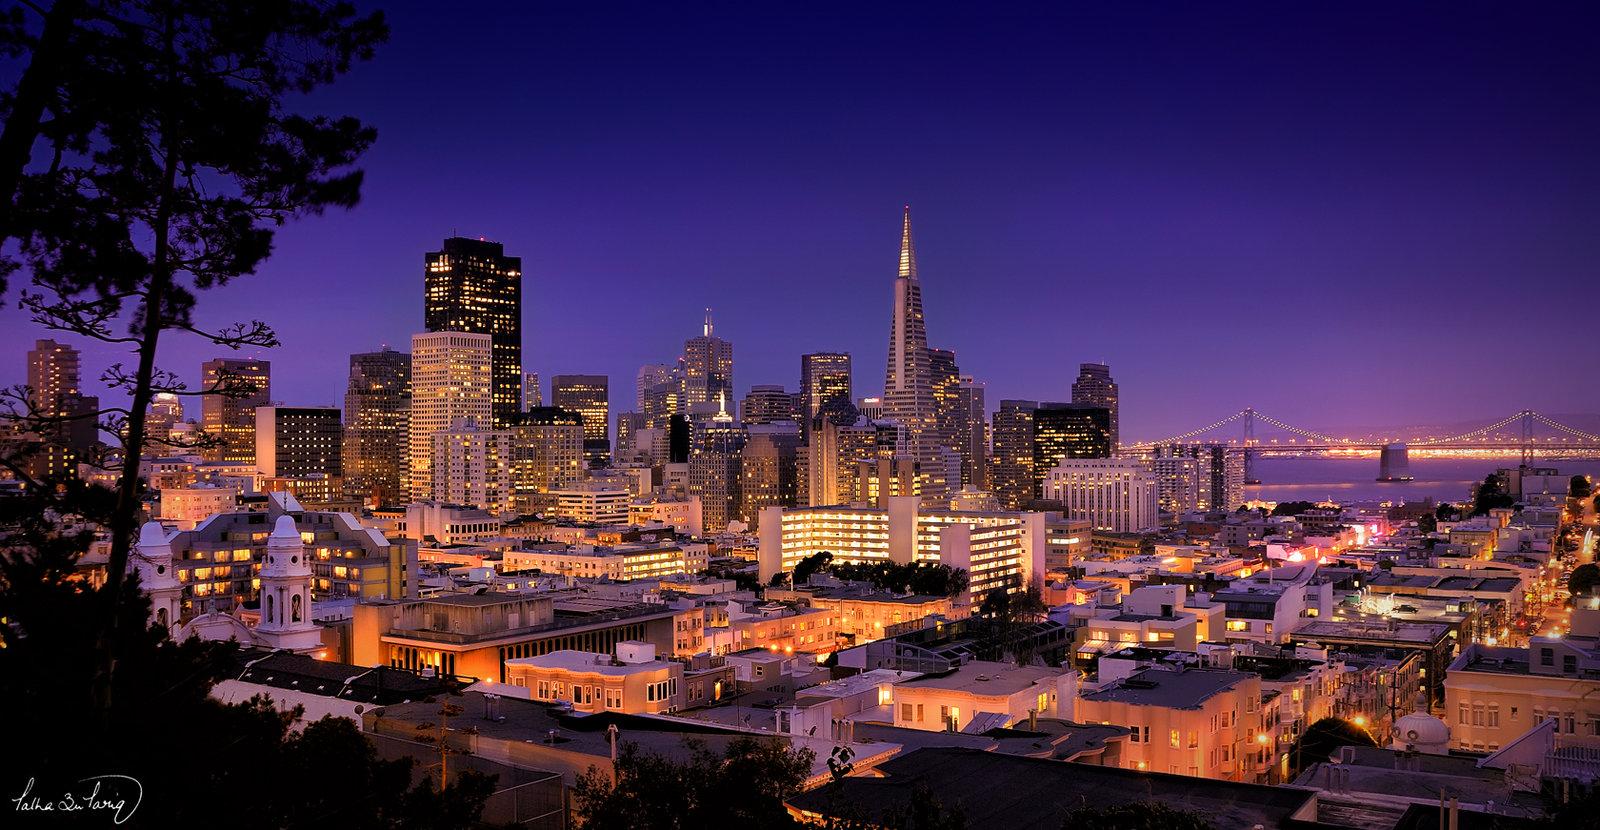 San Francisco Downtown by tt83x 1600x830